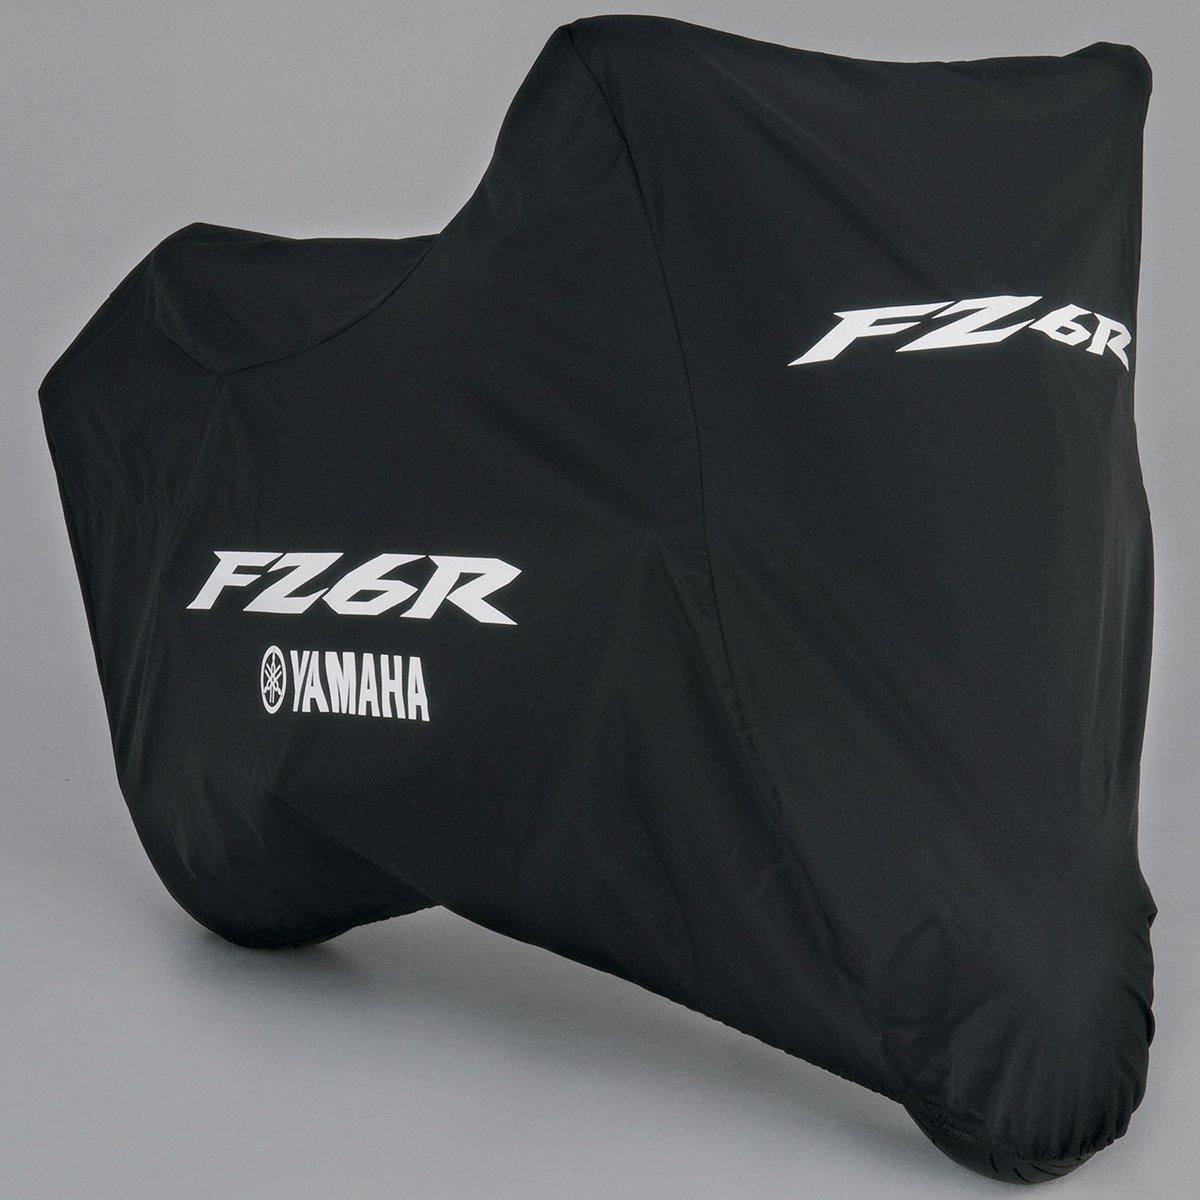 Yamaha 36P-F81A0-V0-00 Bike Cover for Yamaha FZ6R